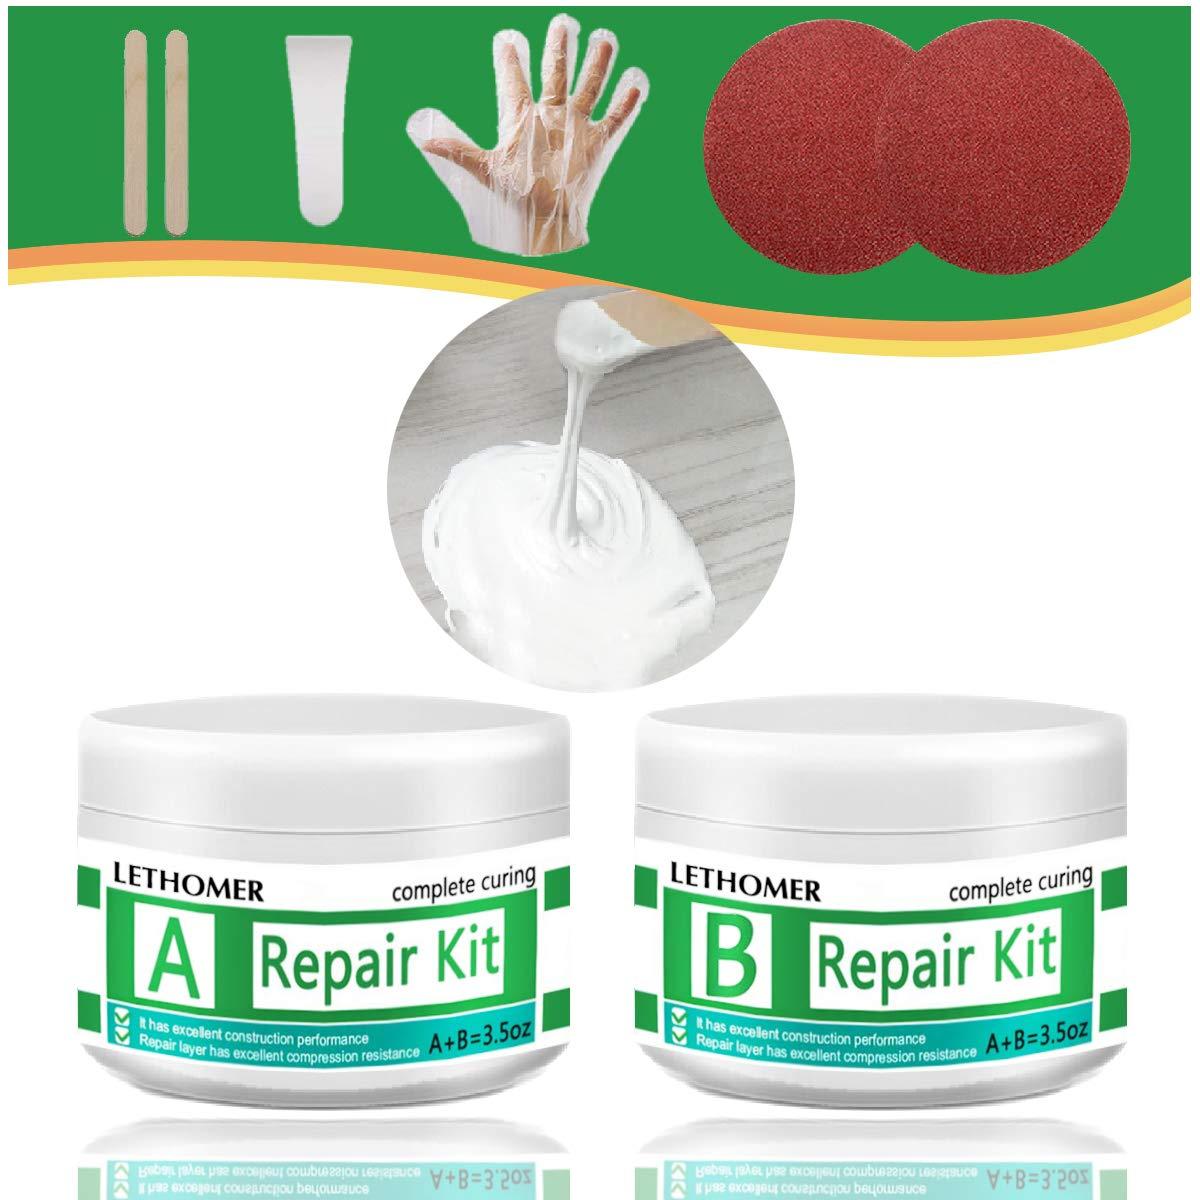 Tub, Tile and Shower Repair Kit, Waterproof Porcelain Repair Kit, Tile and Tub Refinishing kit, Non-toxic and Odorless Fiberglass Repair Kit for Tubs, Toilet, Porcelain, Sink Crack (WHITE)